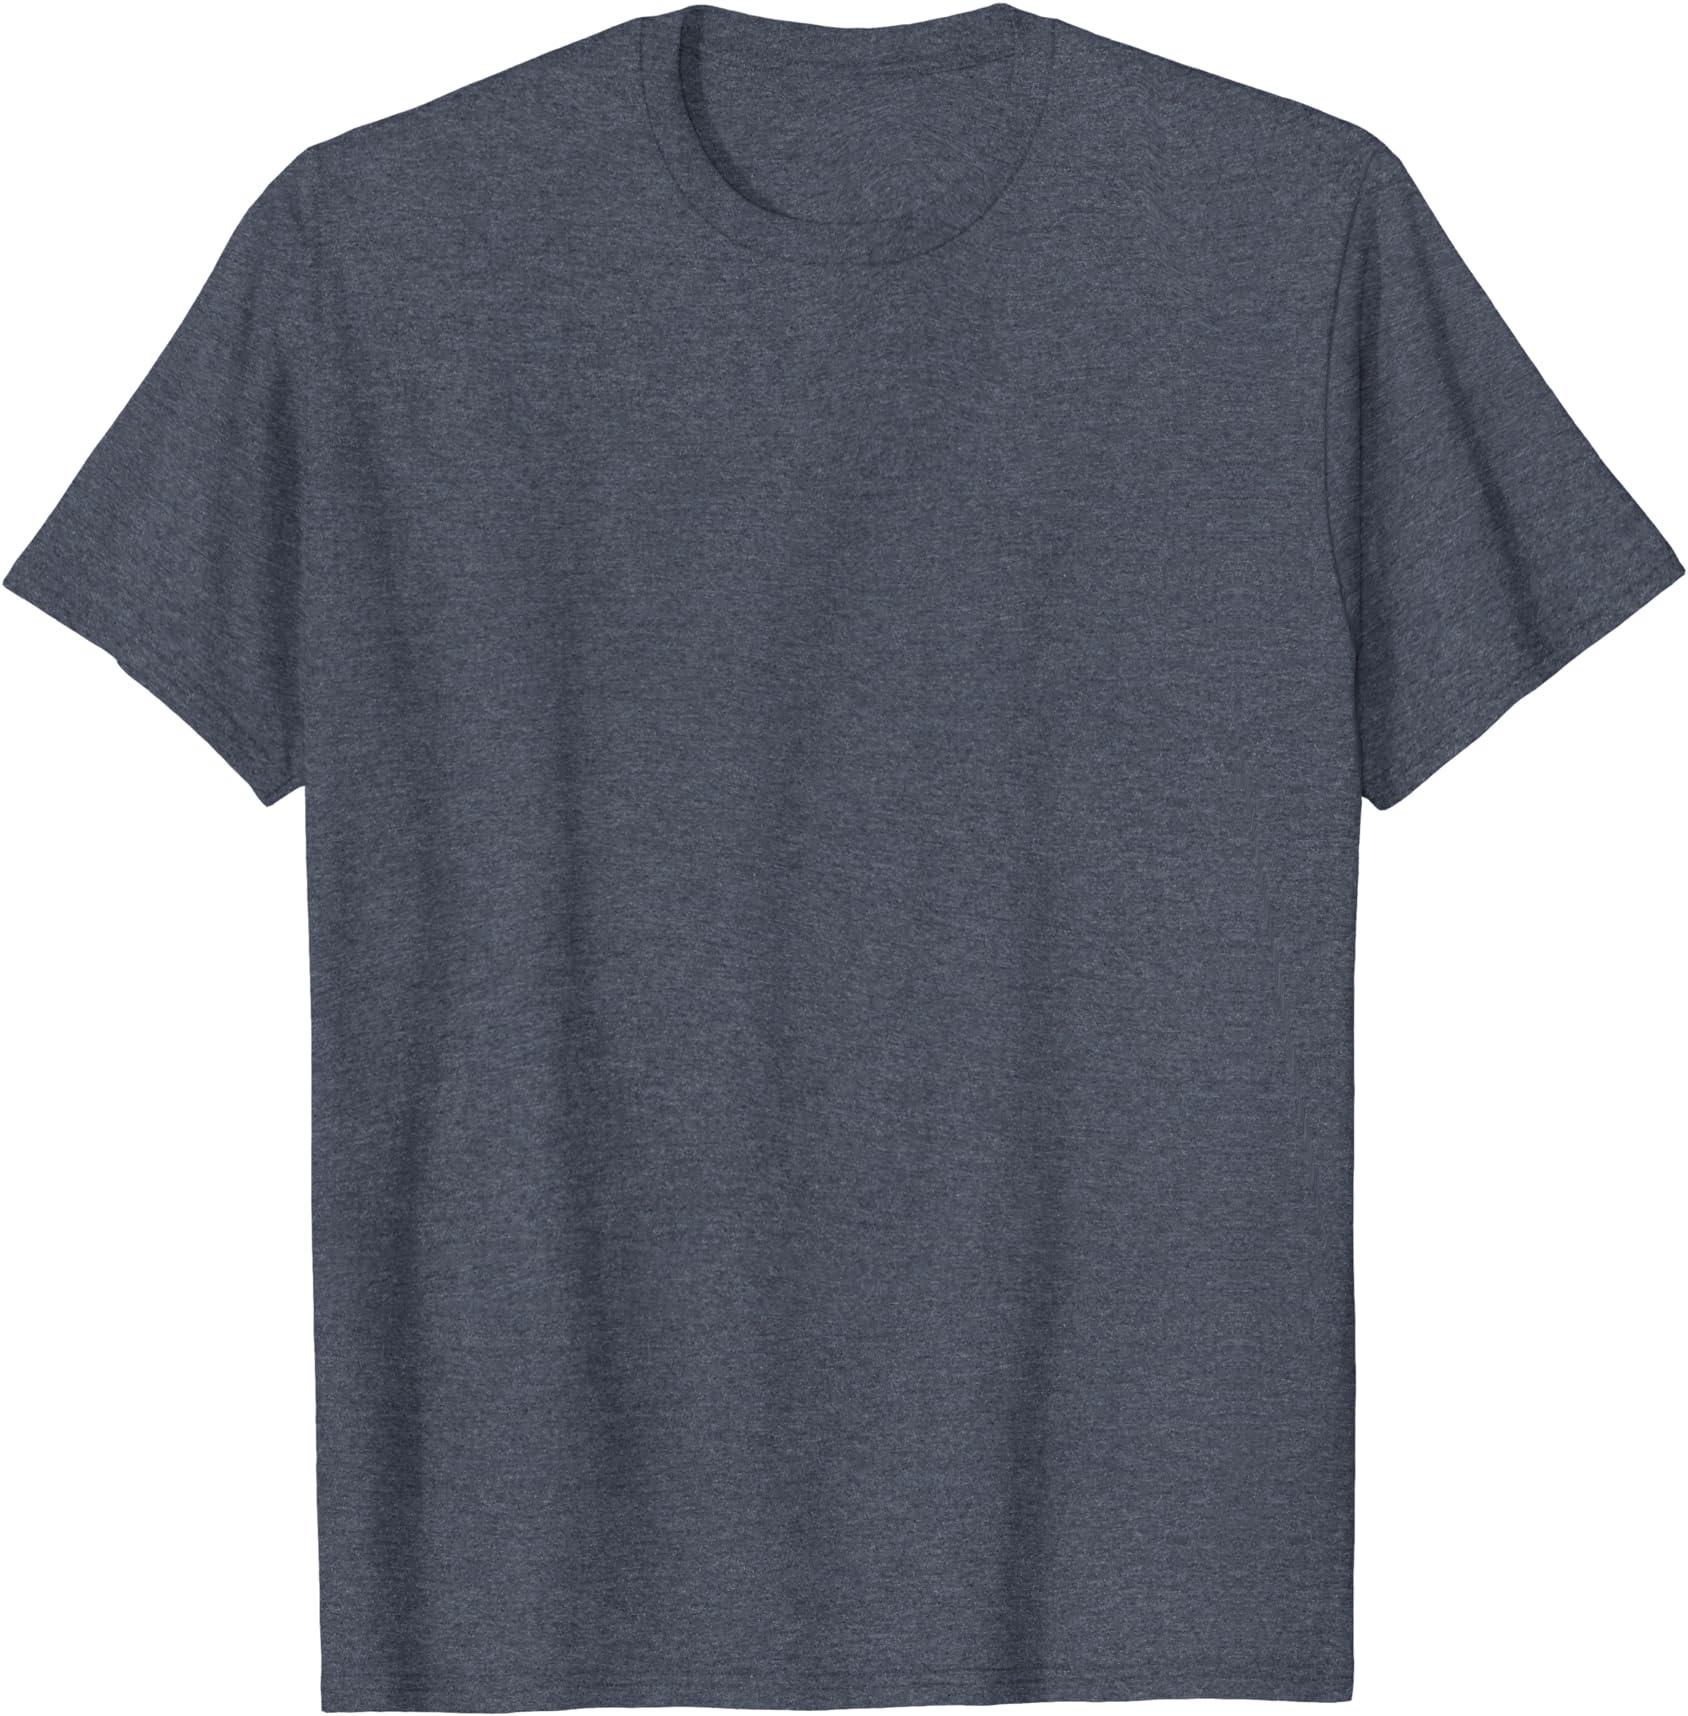 F*ck Cancer Skull /& Crossbones Awareness Month Short Sleeve Men/'s T-Shirt